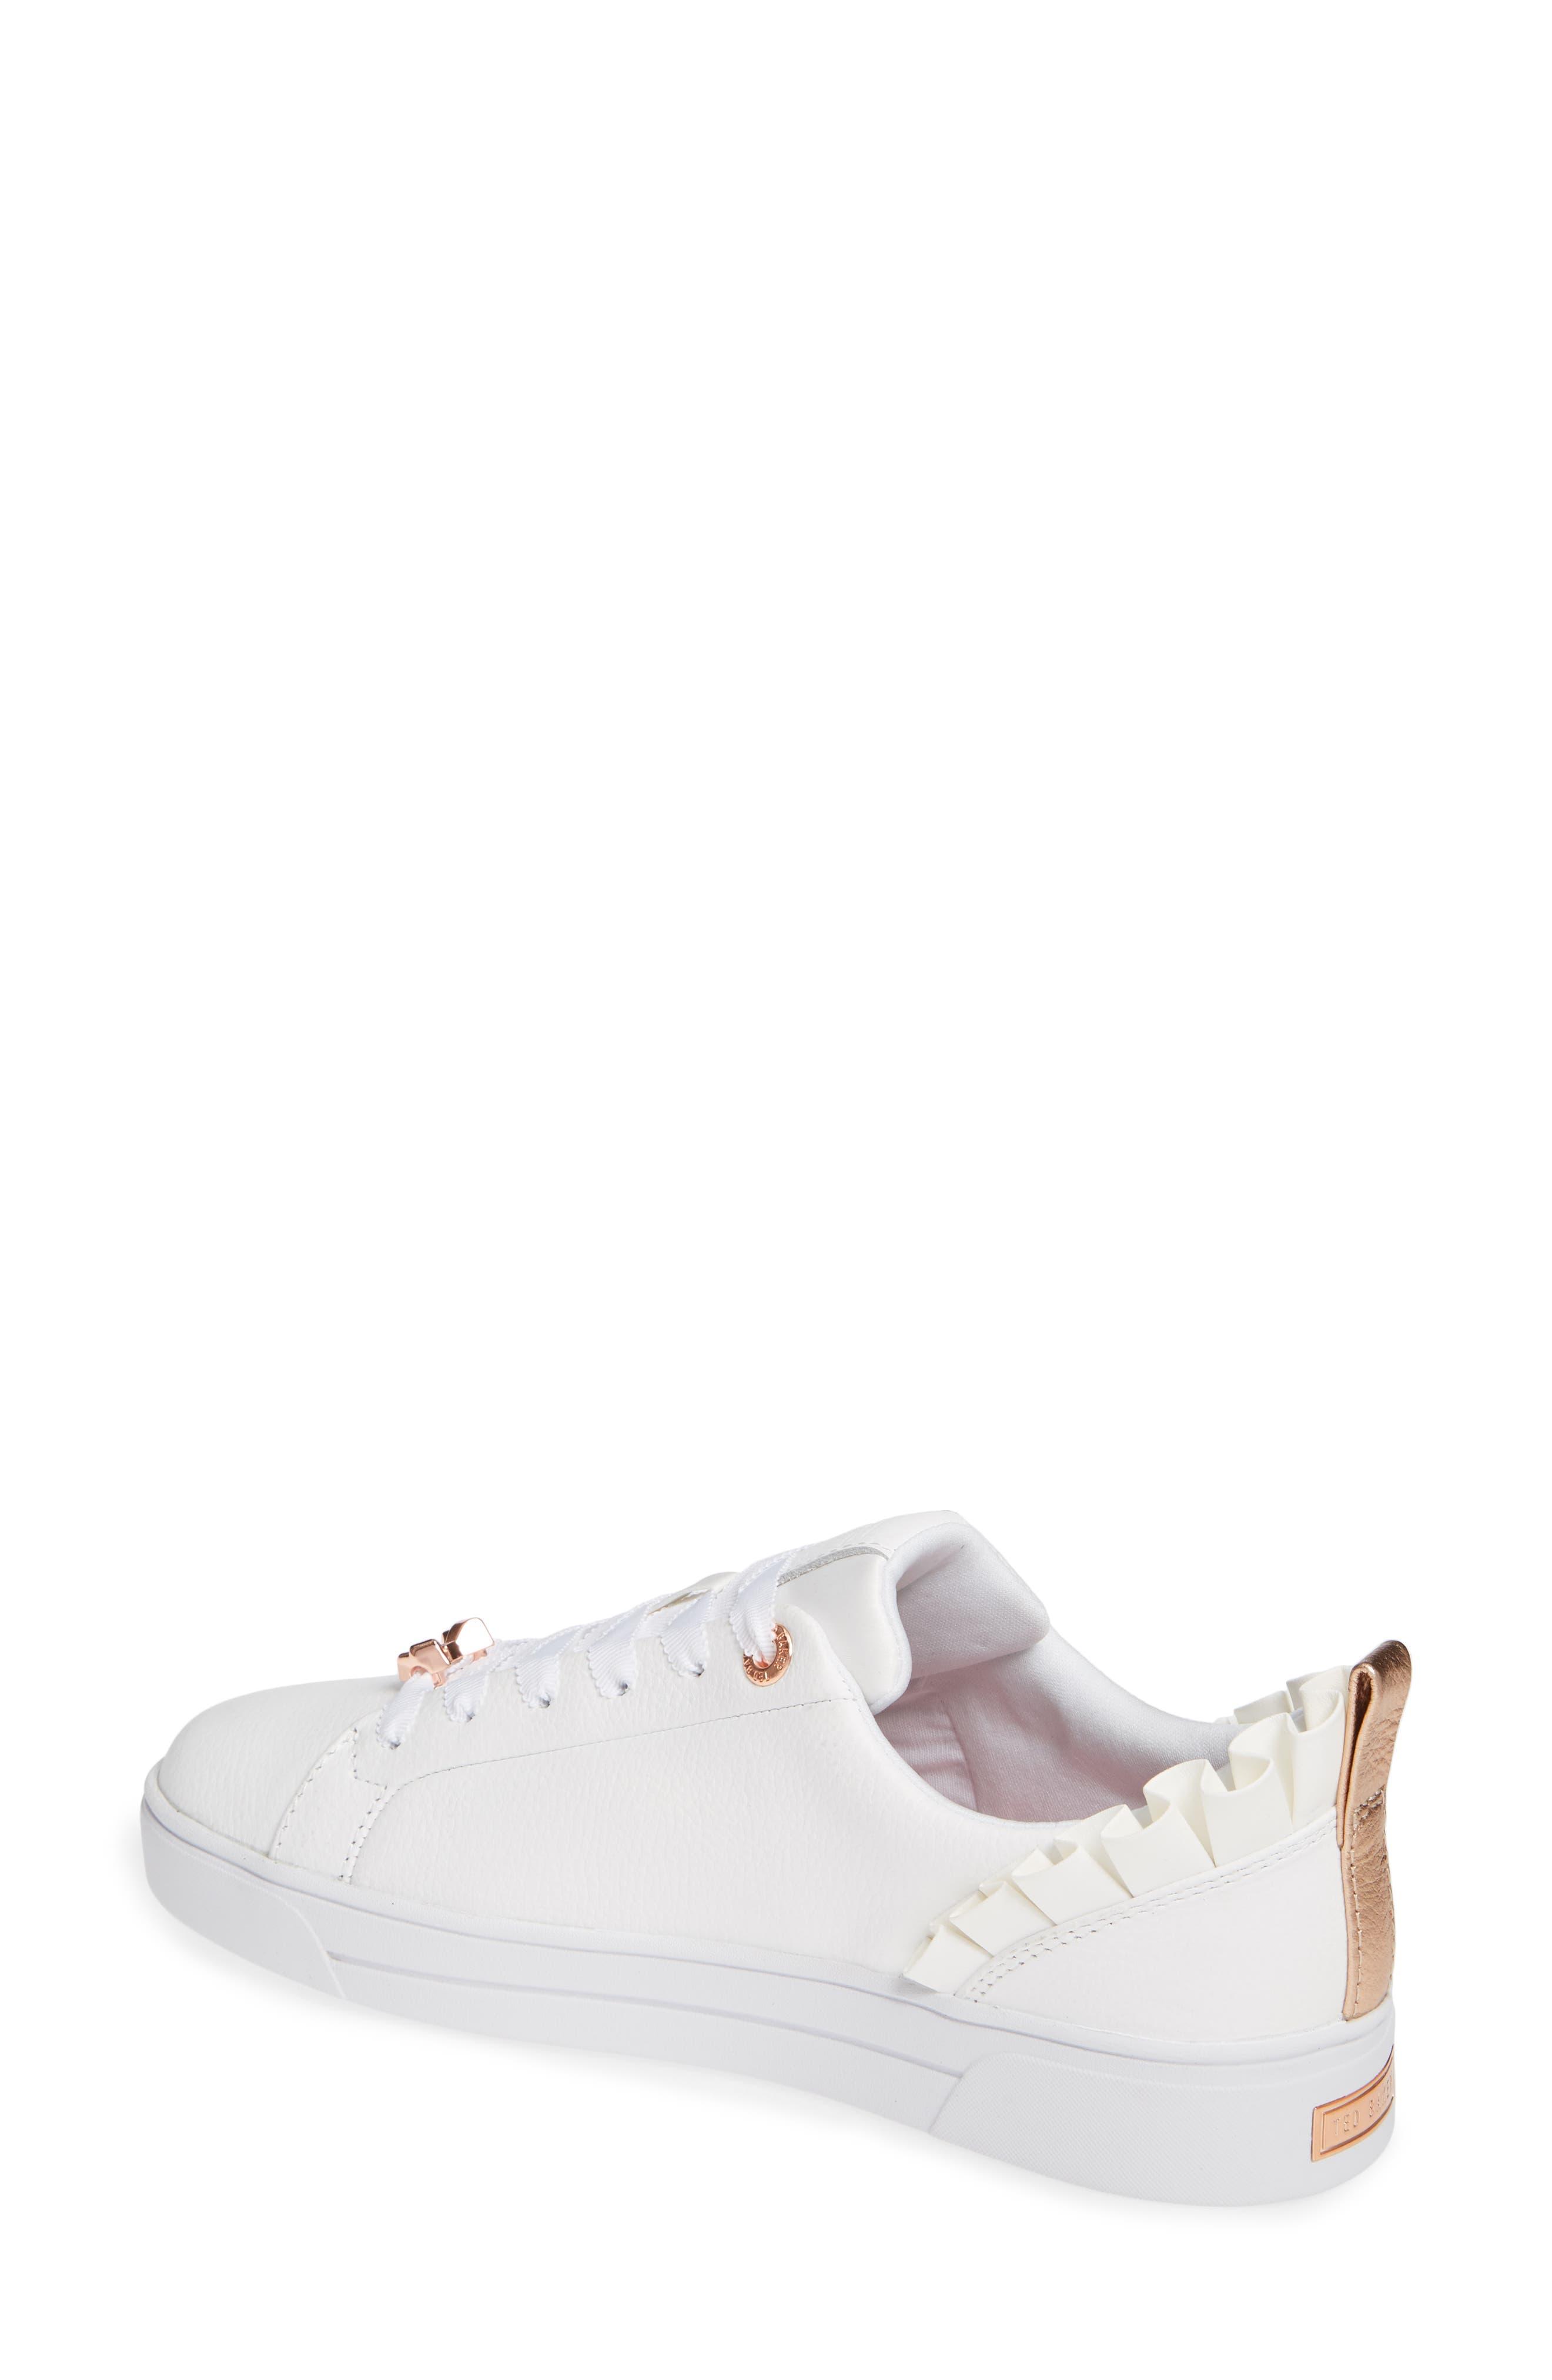 Astrina Sneaker,                             Alternate thumbnail 2, color,                             WHITE LEATHER